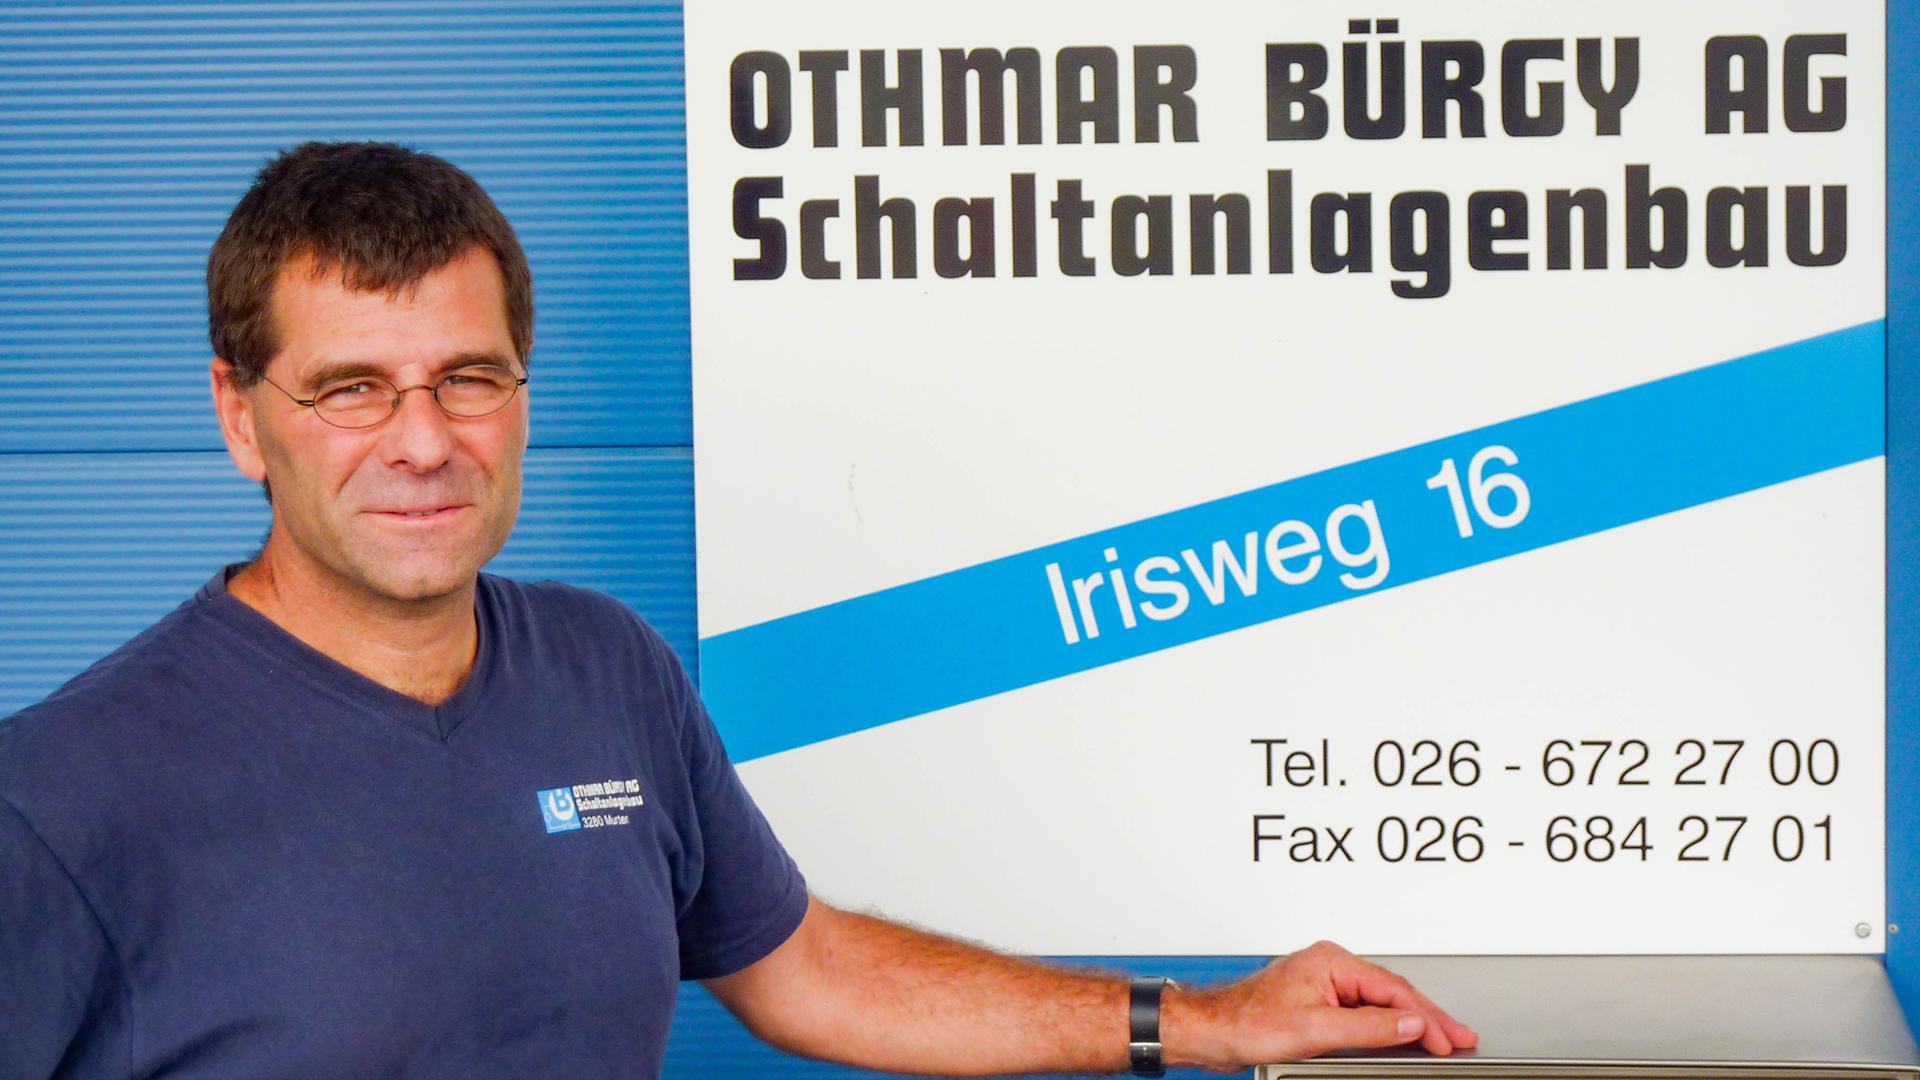 Othmar Bürgy